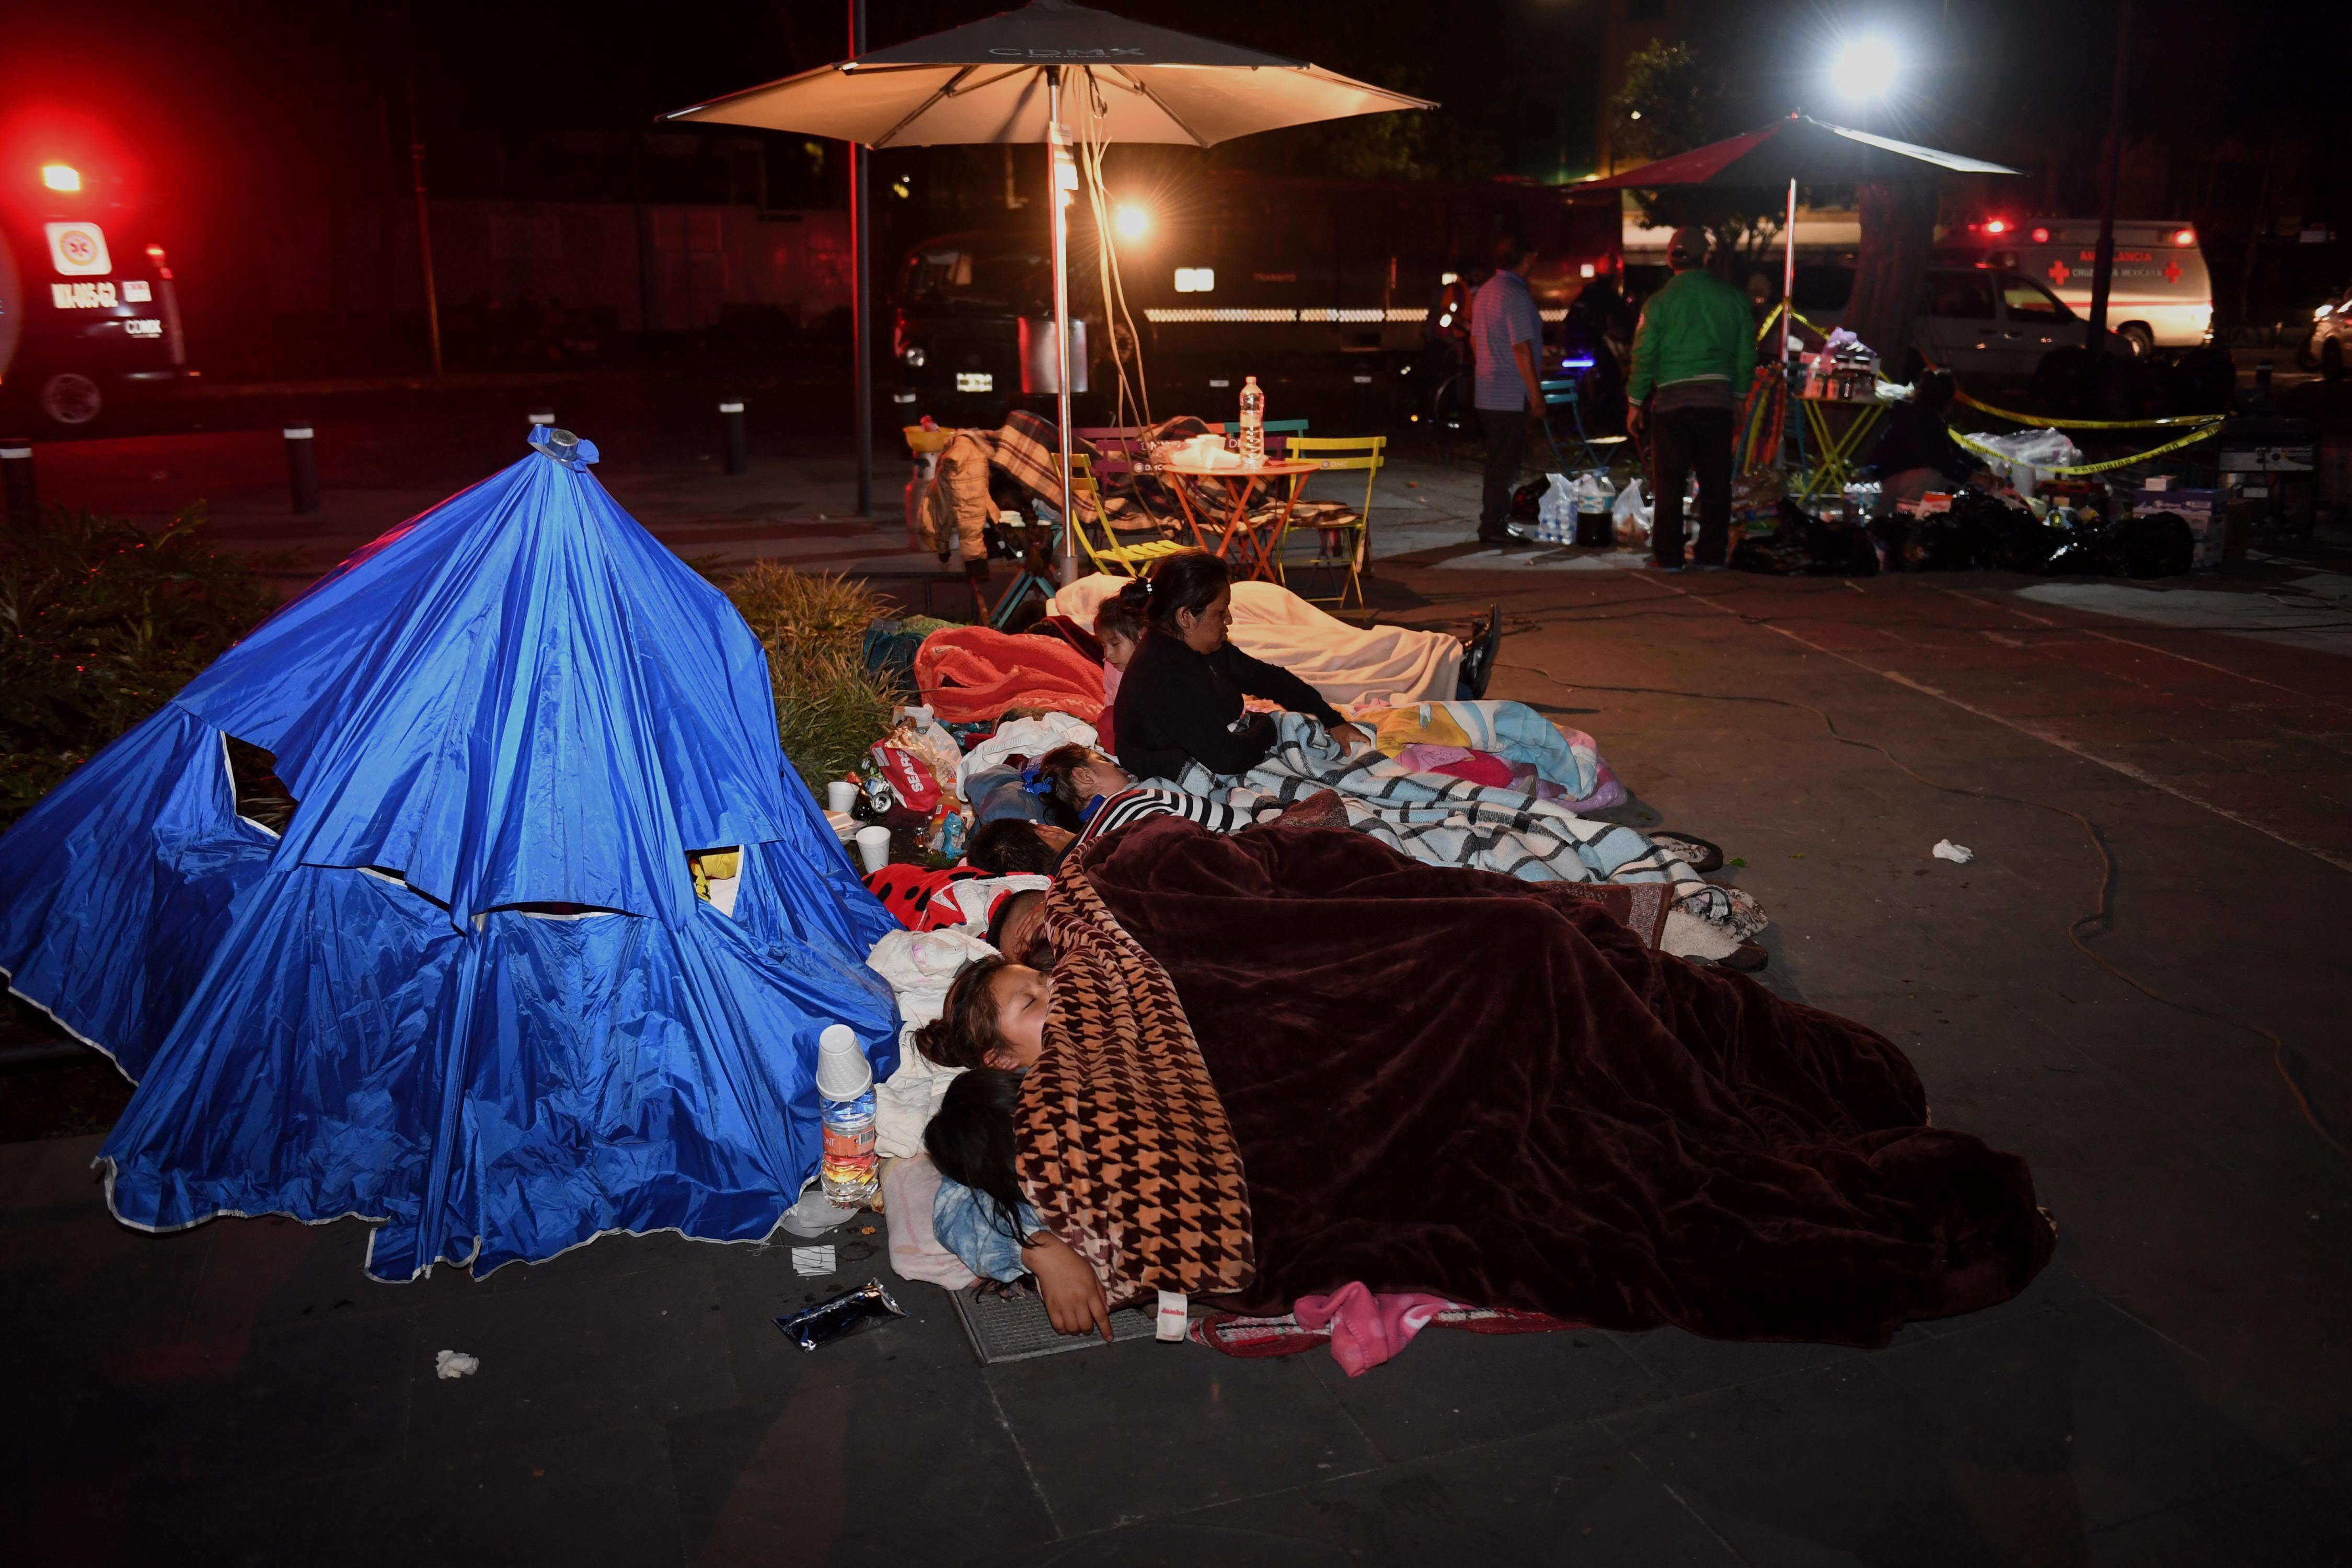 Duermen en albergues, banquetas, parques y coches